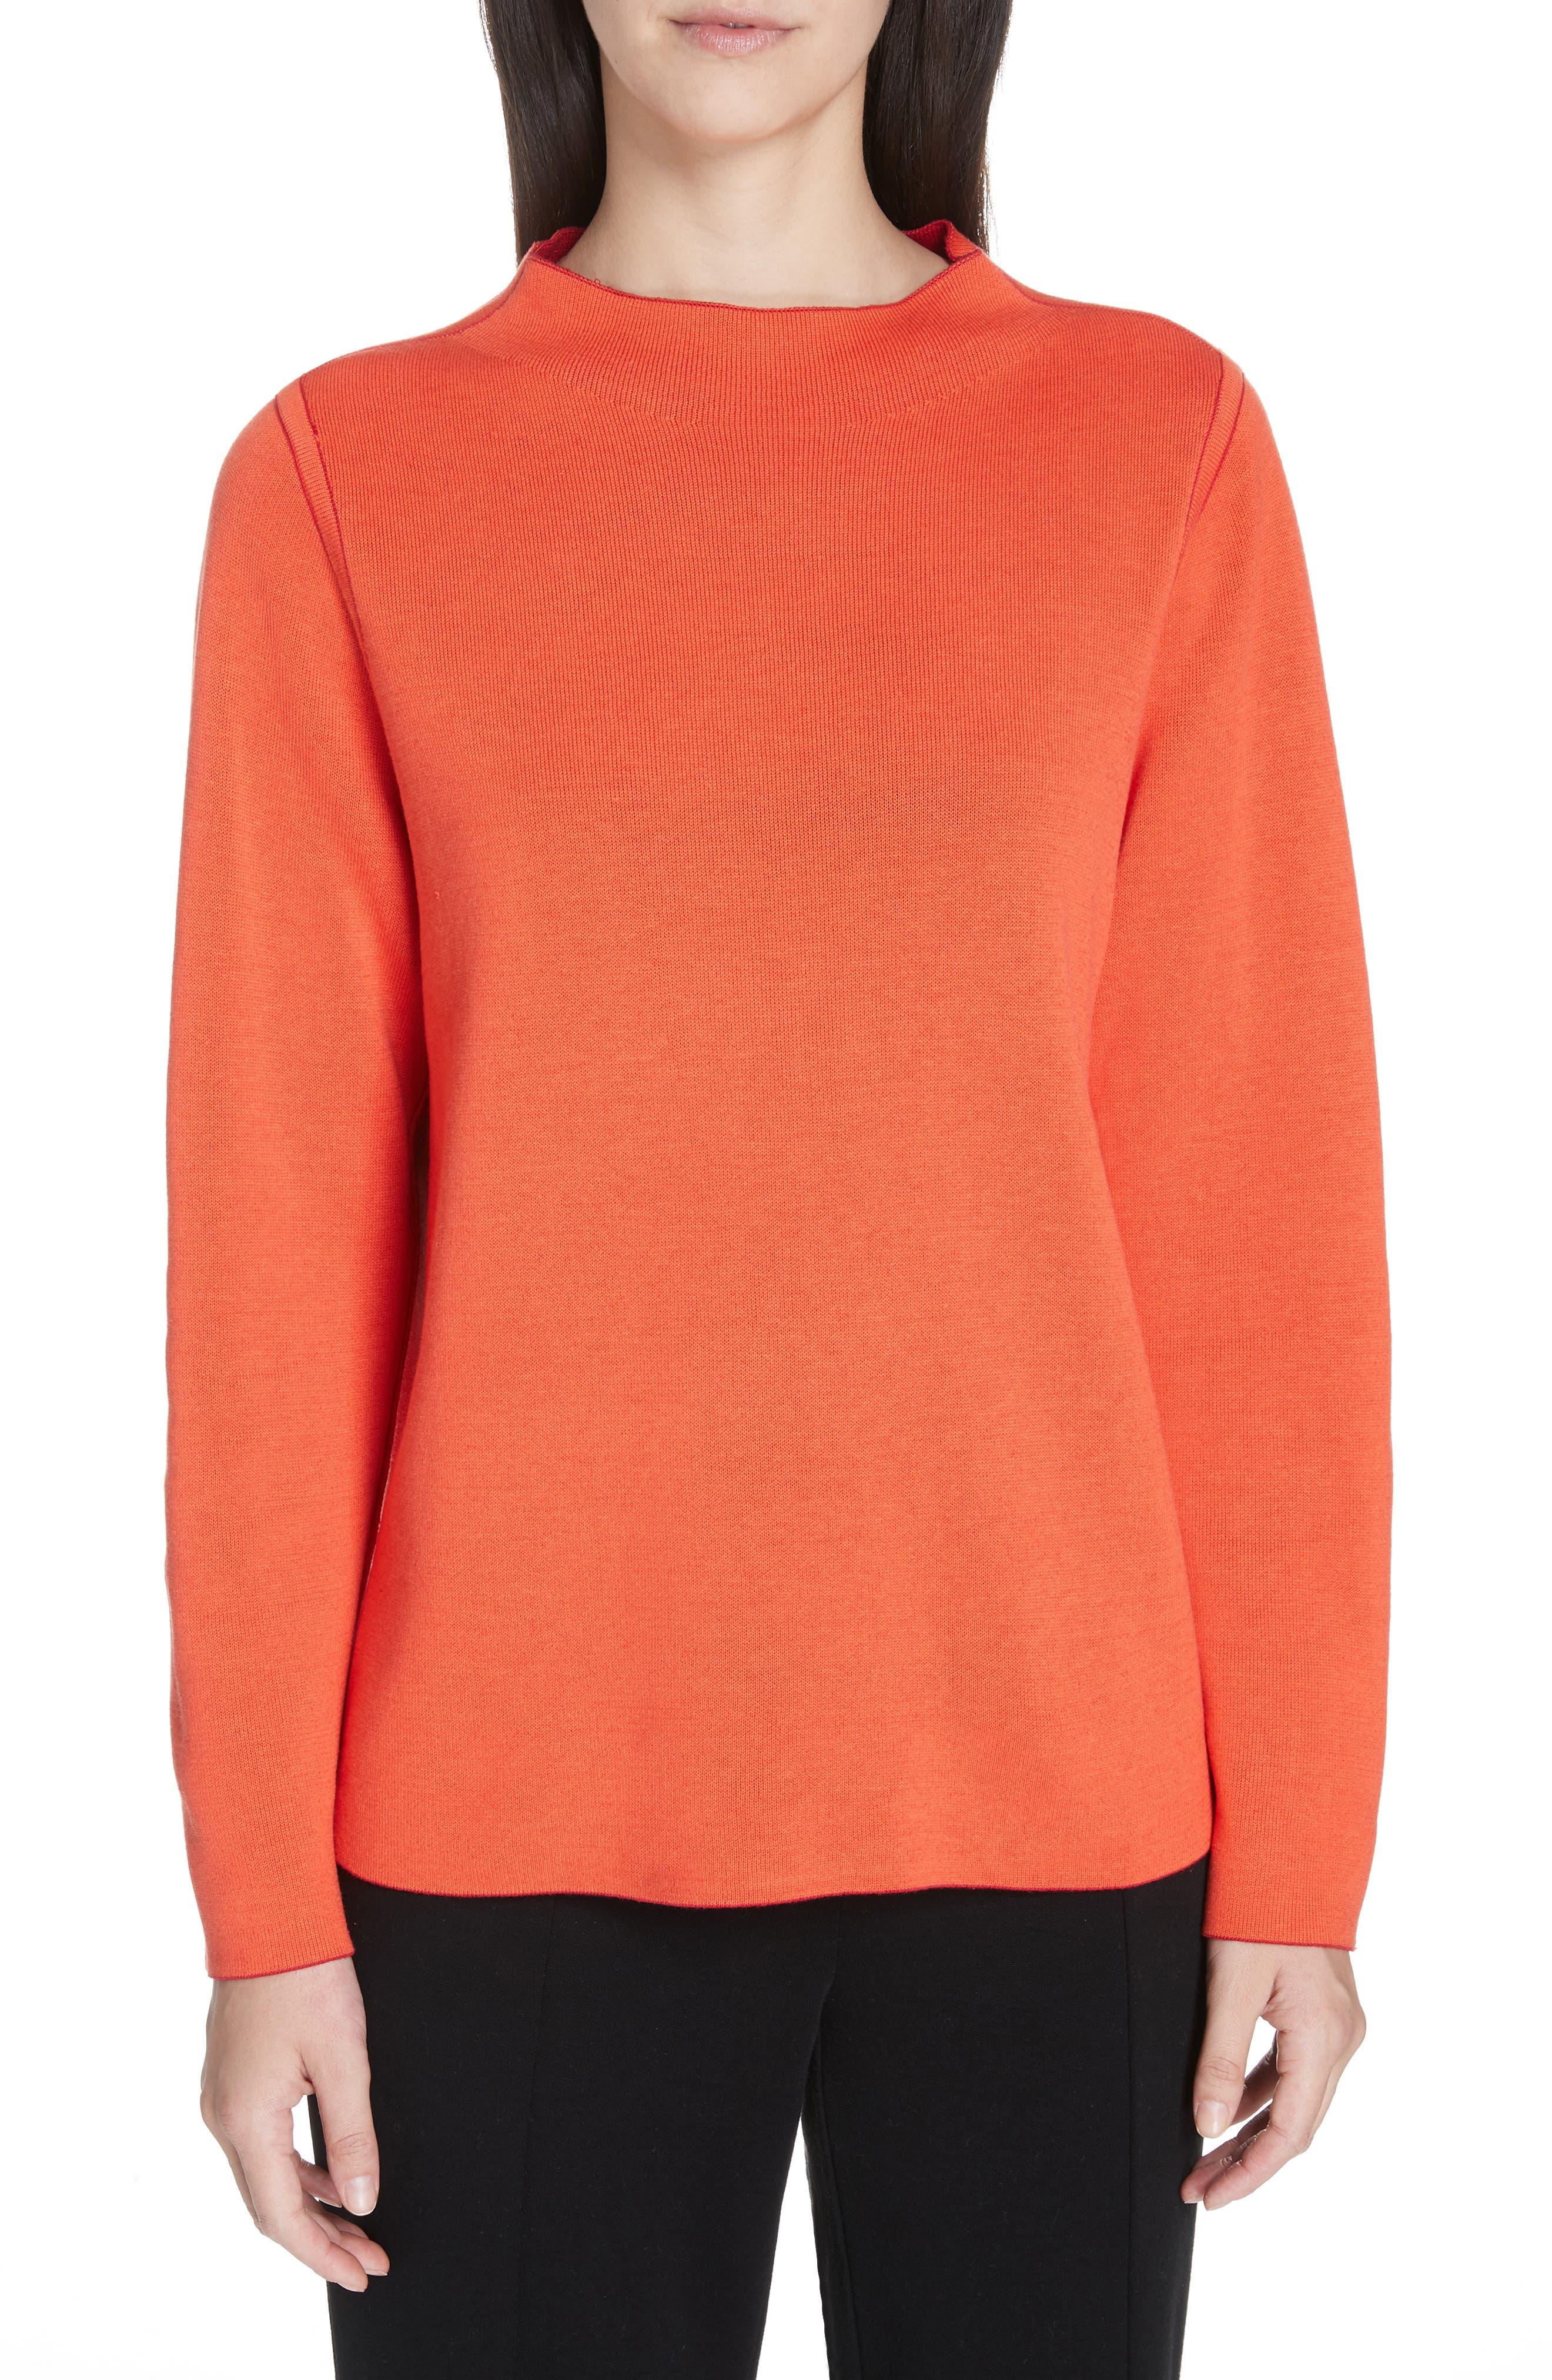 EILEEN FISHER, Reversilble Silk Blend Sweater, Alternate thumbnail 2, color, LACQUER